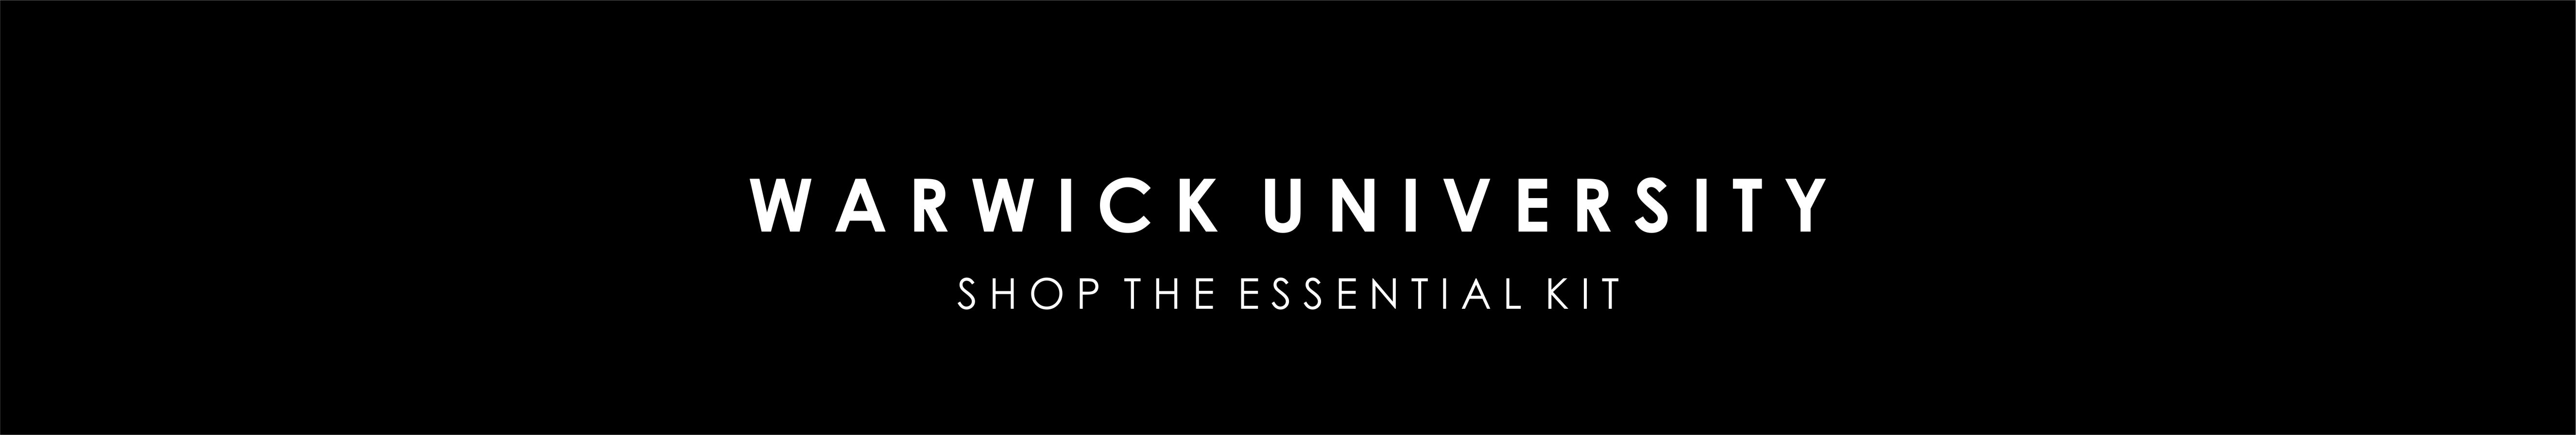 warwick-university-banner-main-page.jpg